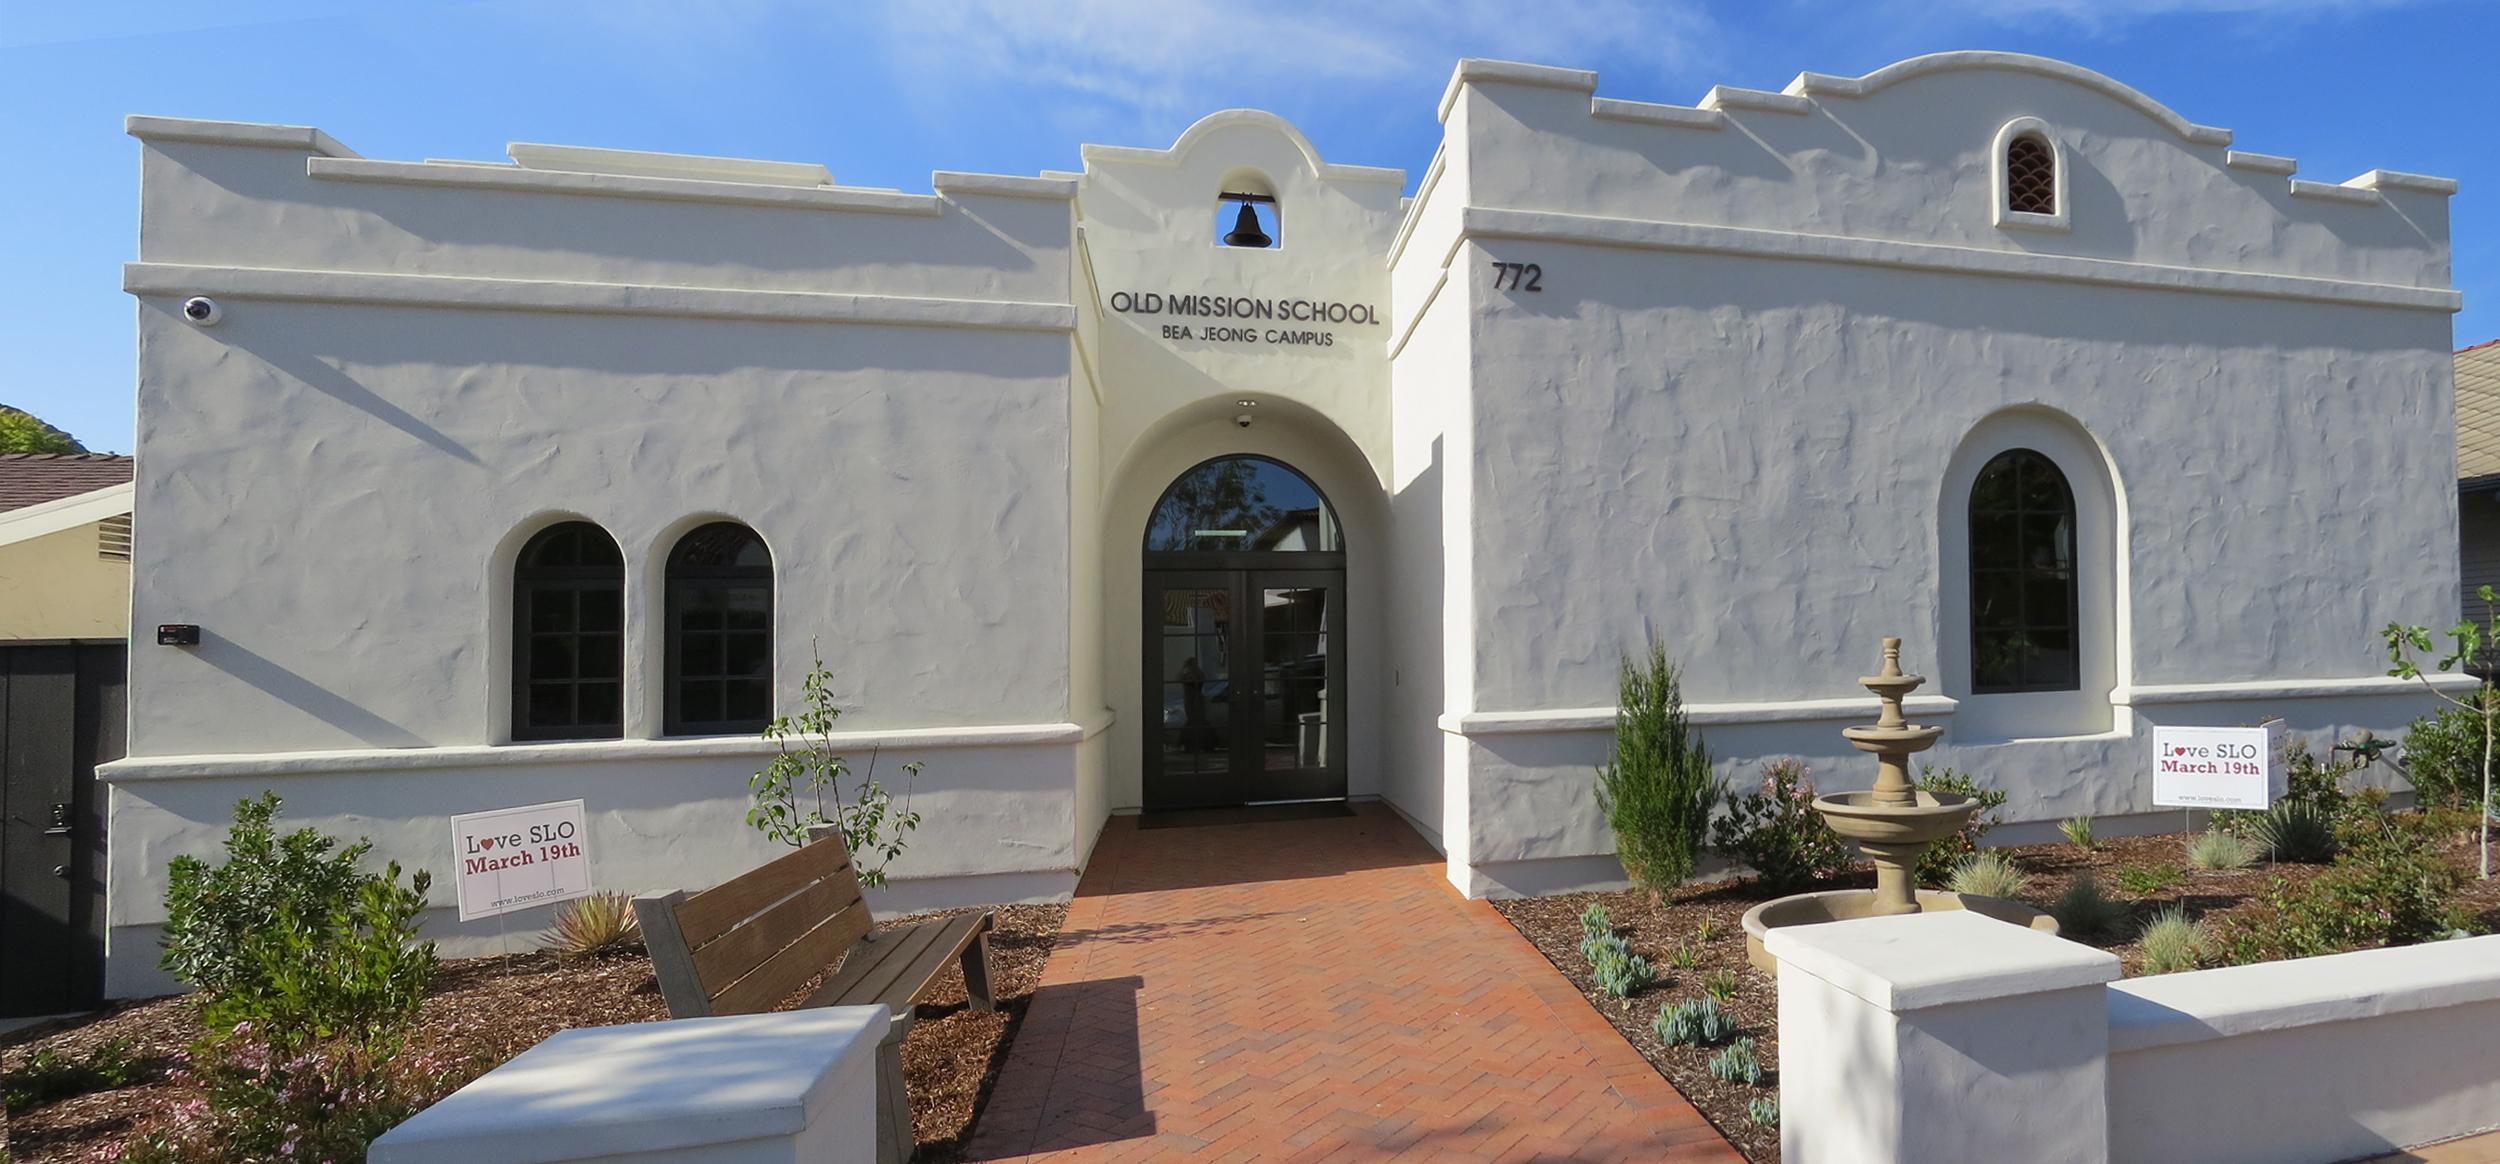 New Educational Building in San Luis Obispo, Ca.